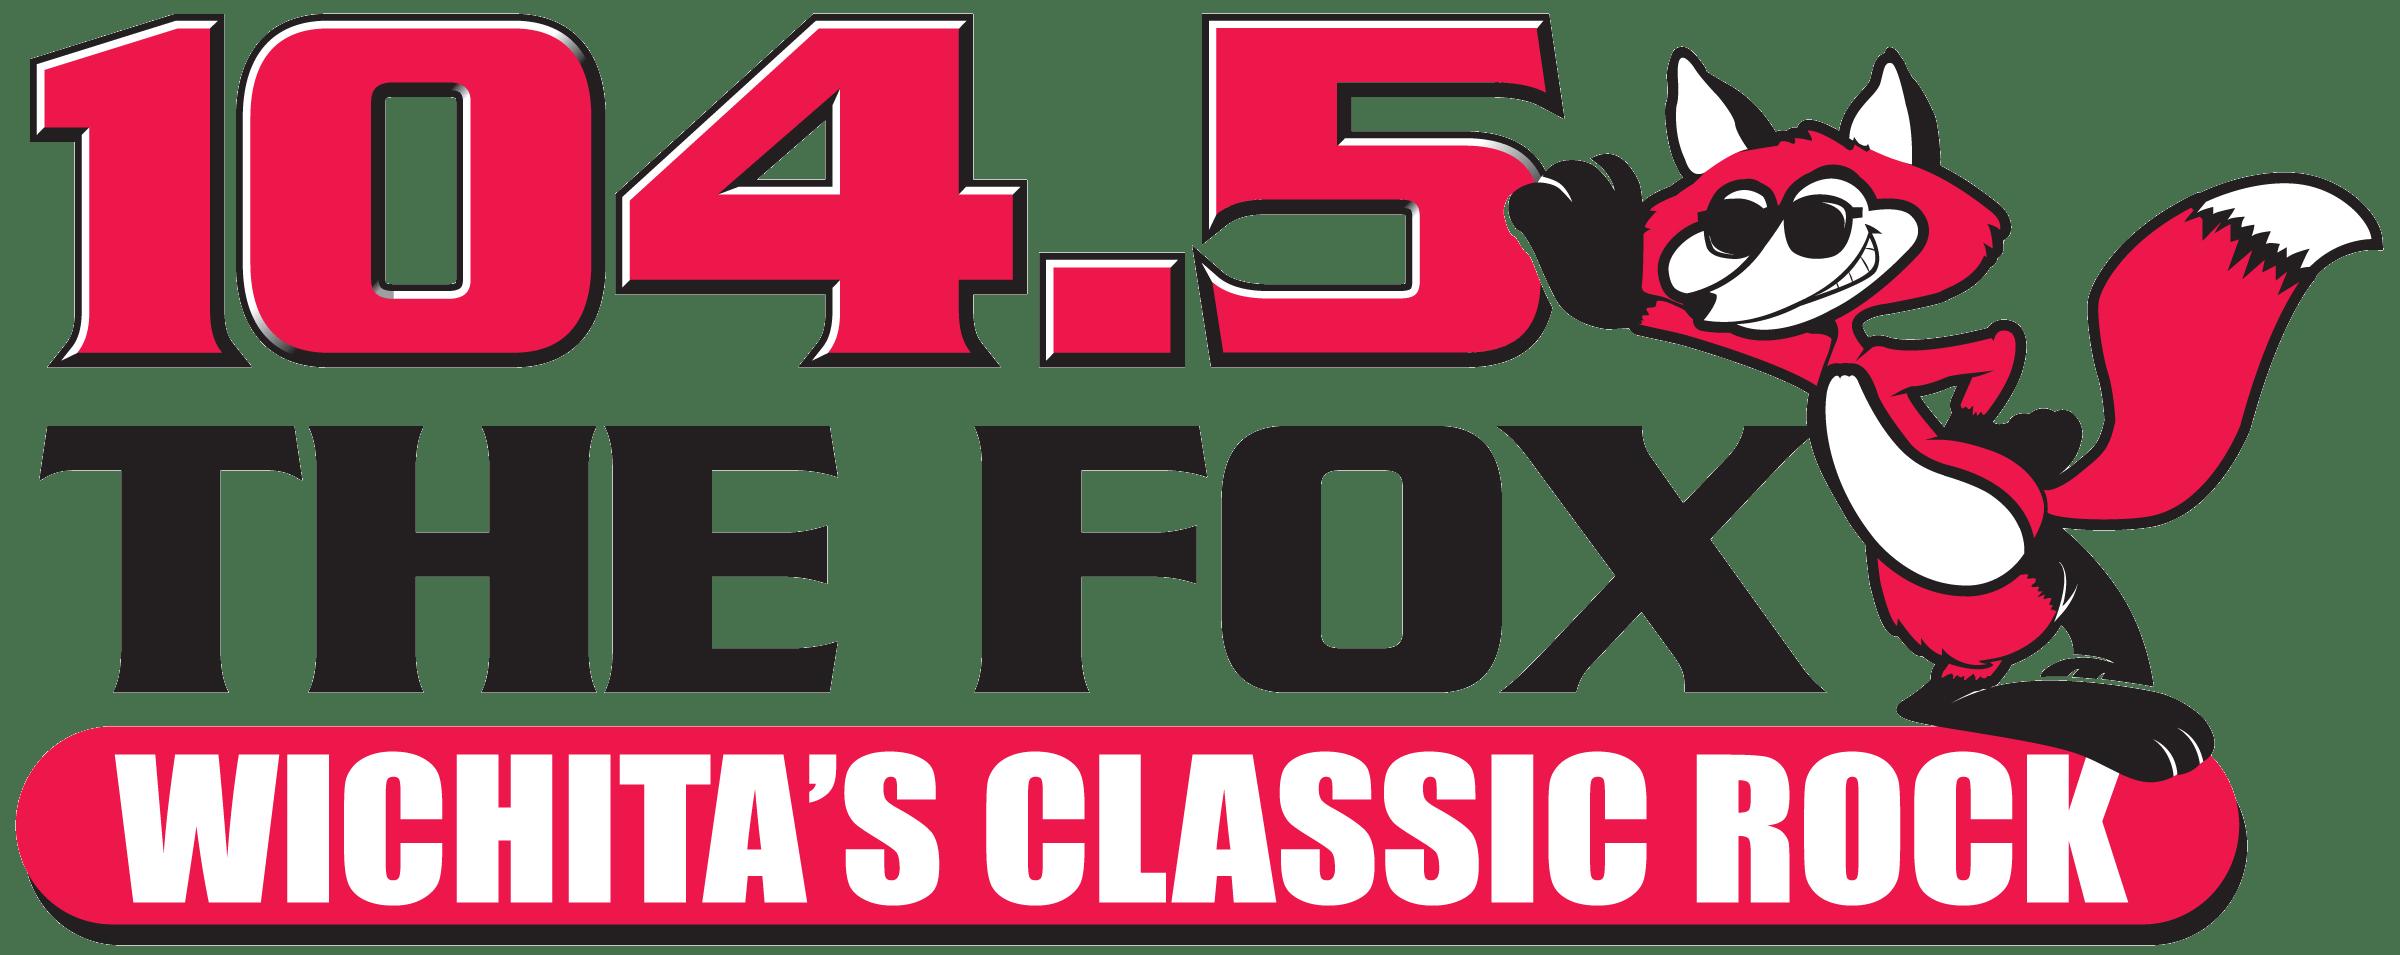 104 5 The Fox - Wichita's Classic Rock - KFXJ-FM